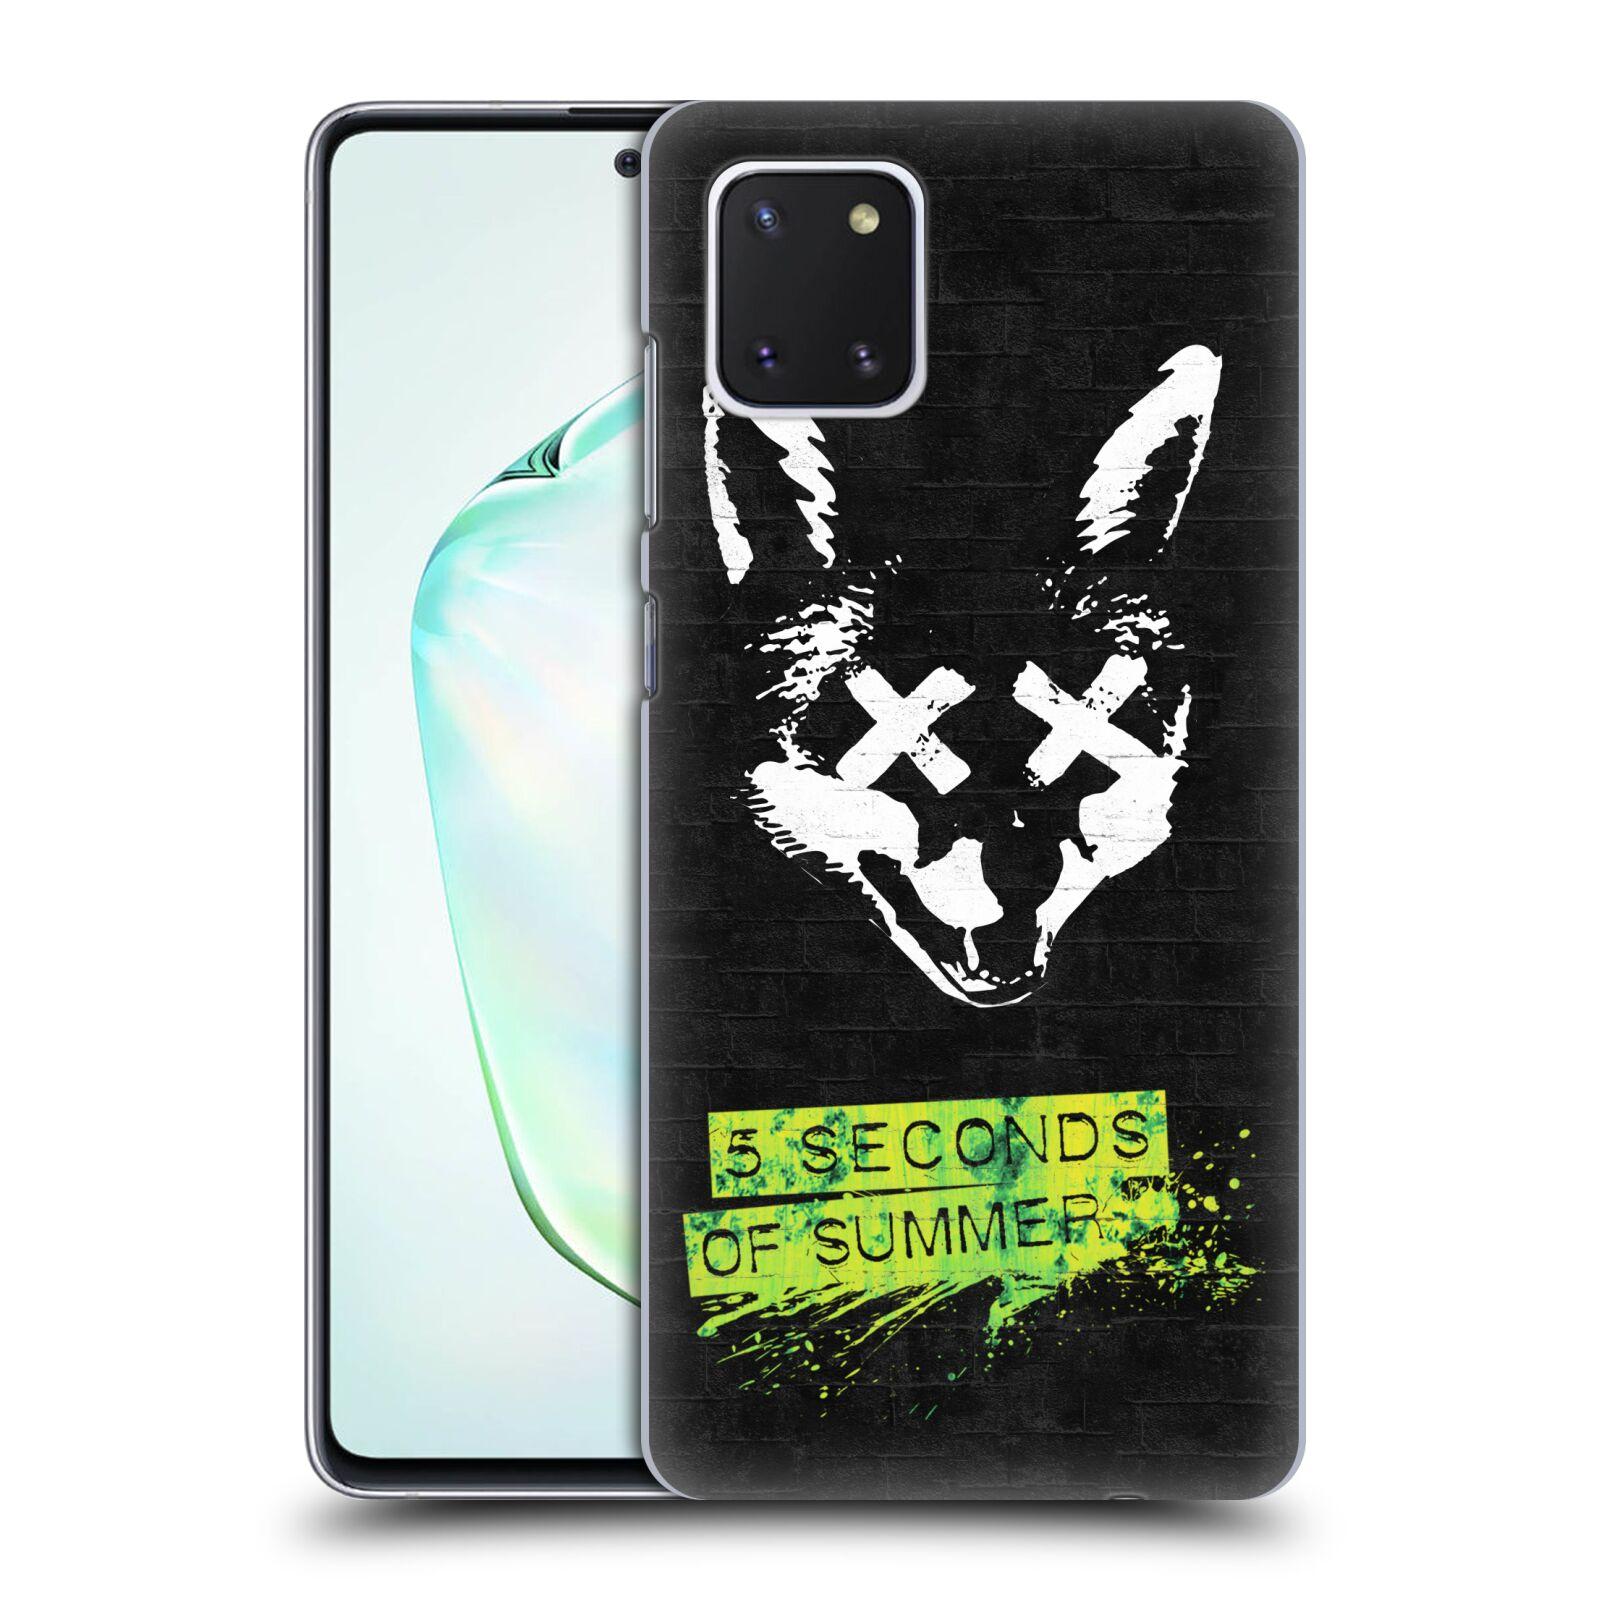 Plastové pouzdro na mobil Samsung Galaxy Note 10 Lite - Head Case - 5 Seconds of Summer - Fox